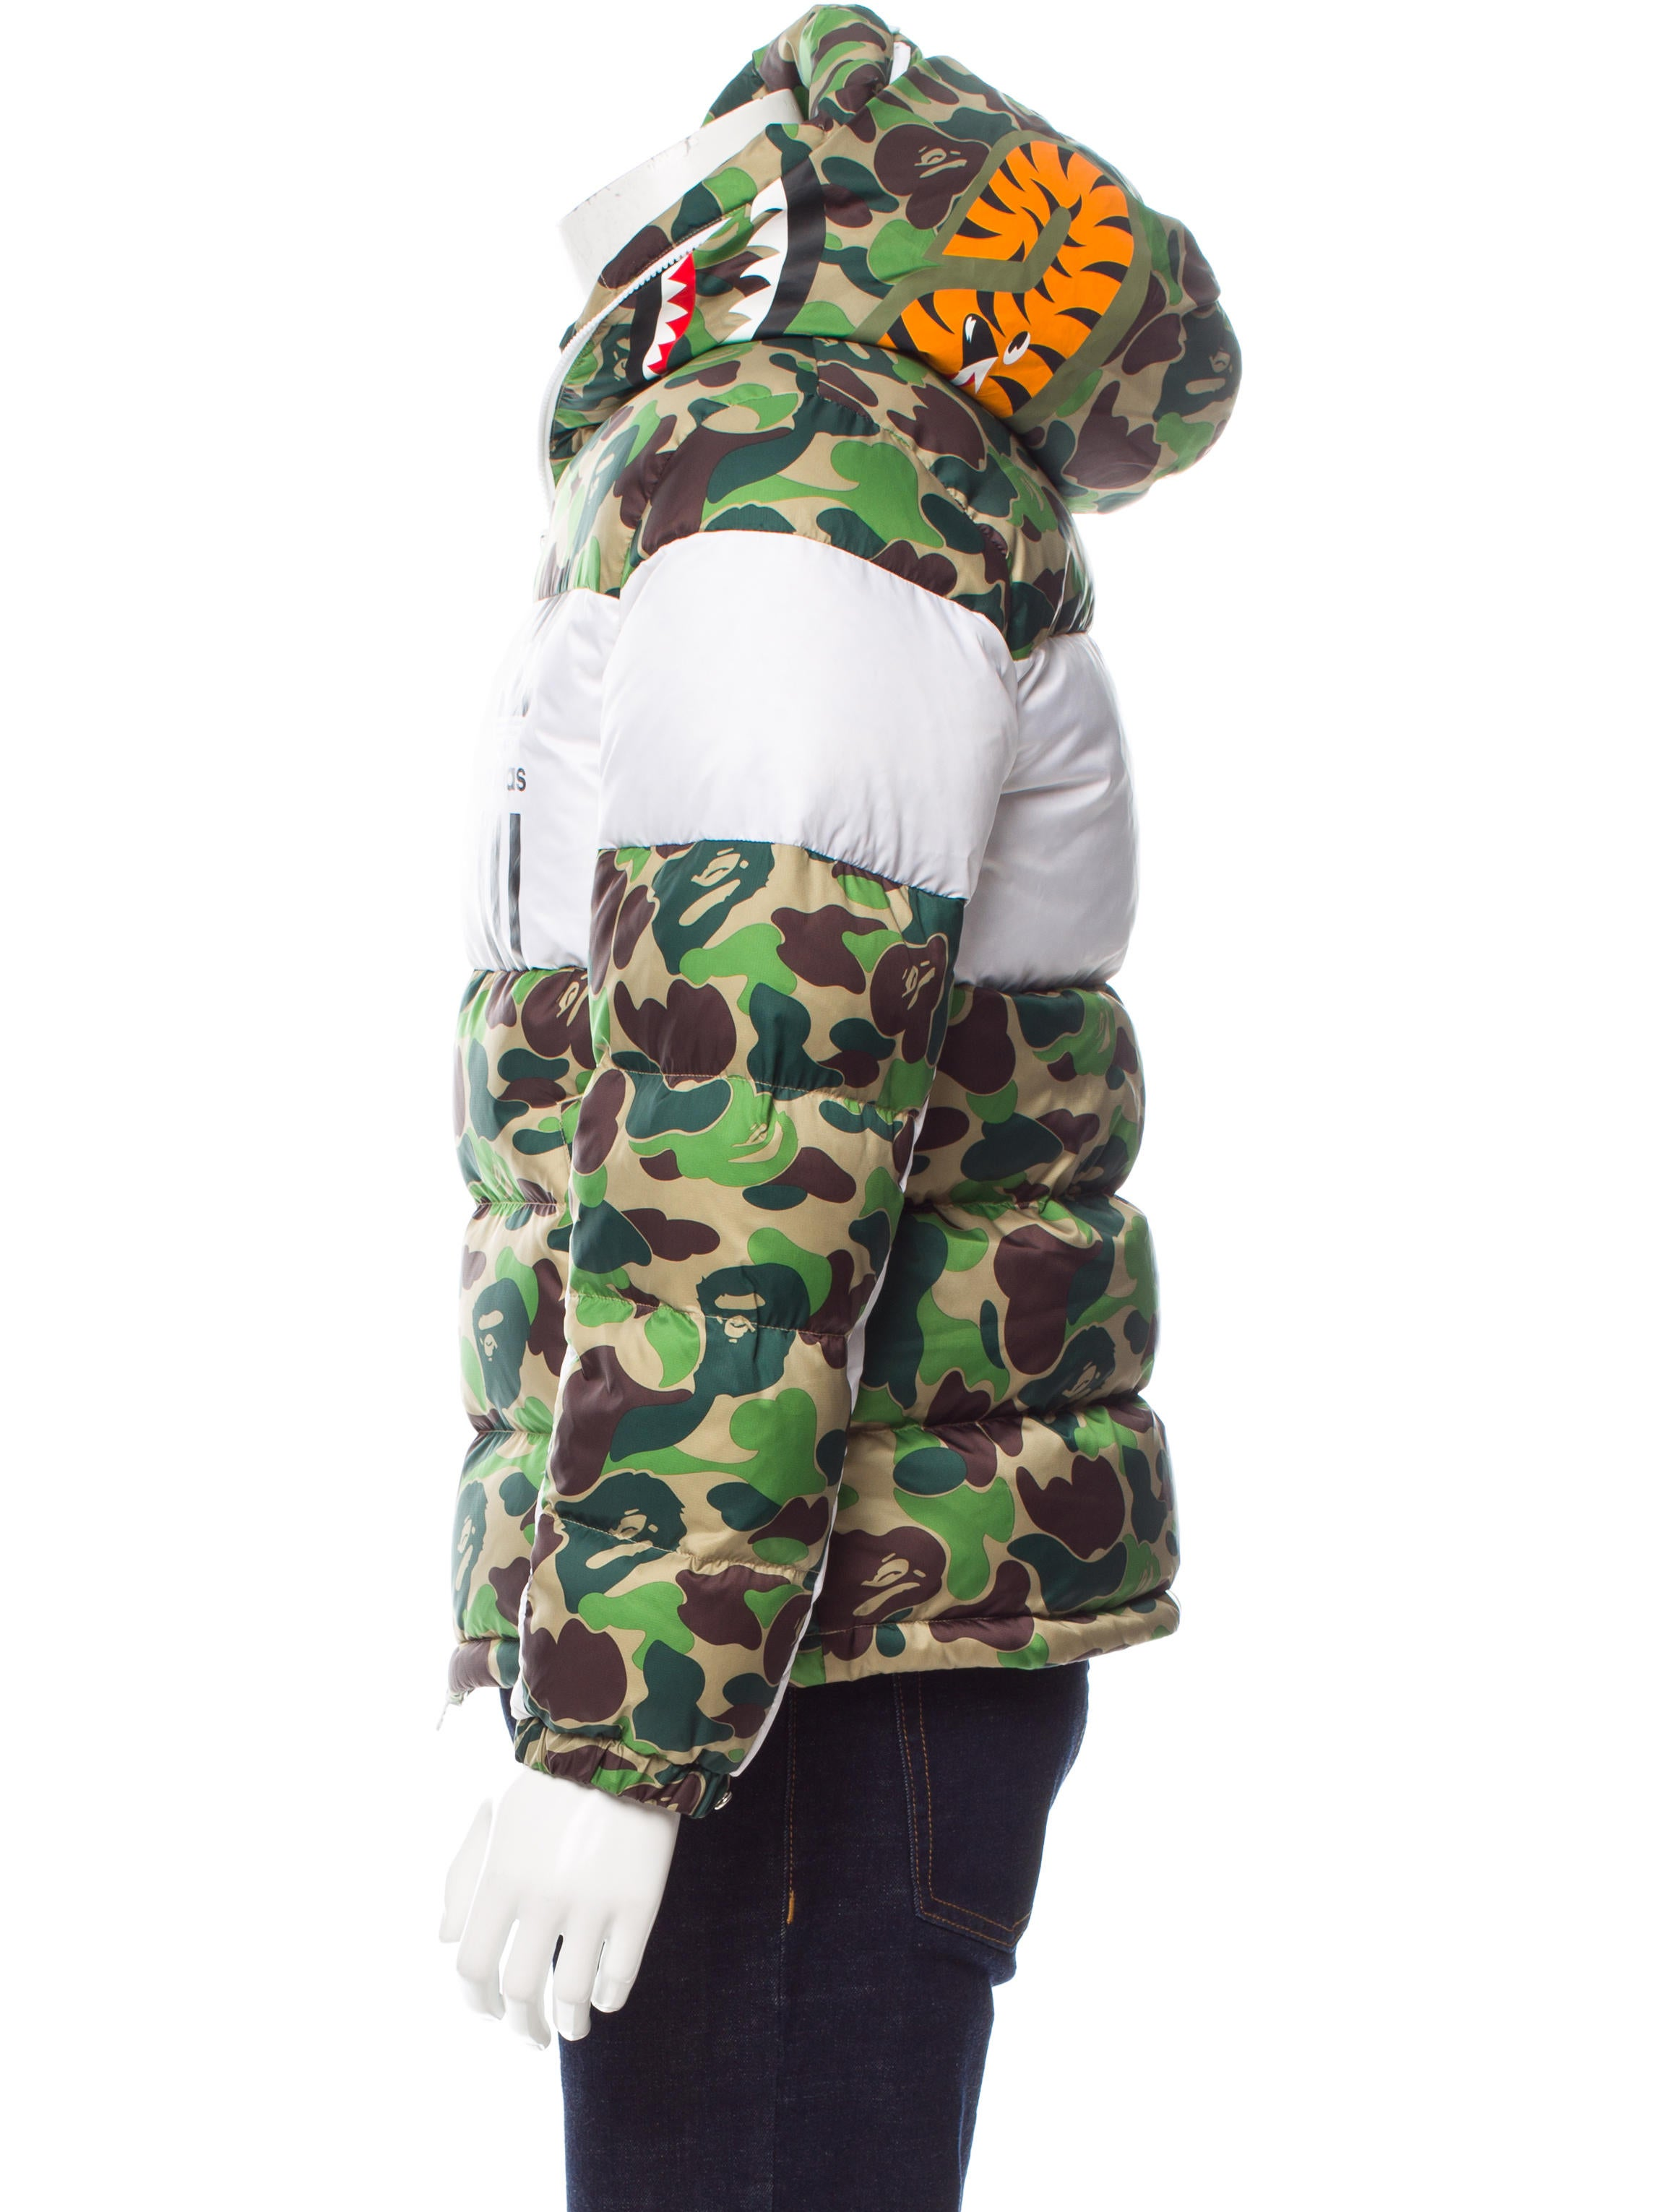 adidas originals x bape camouflage puffer jacket. Black Bedroom Furniture Sets. Home Design Ideas